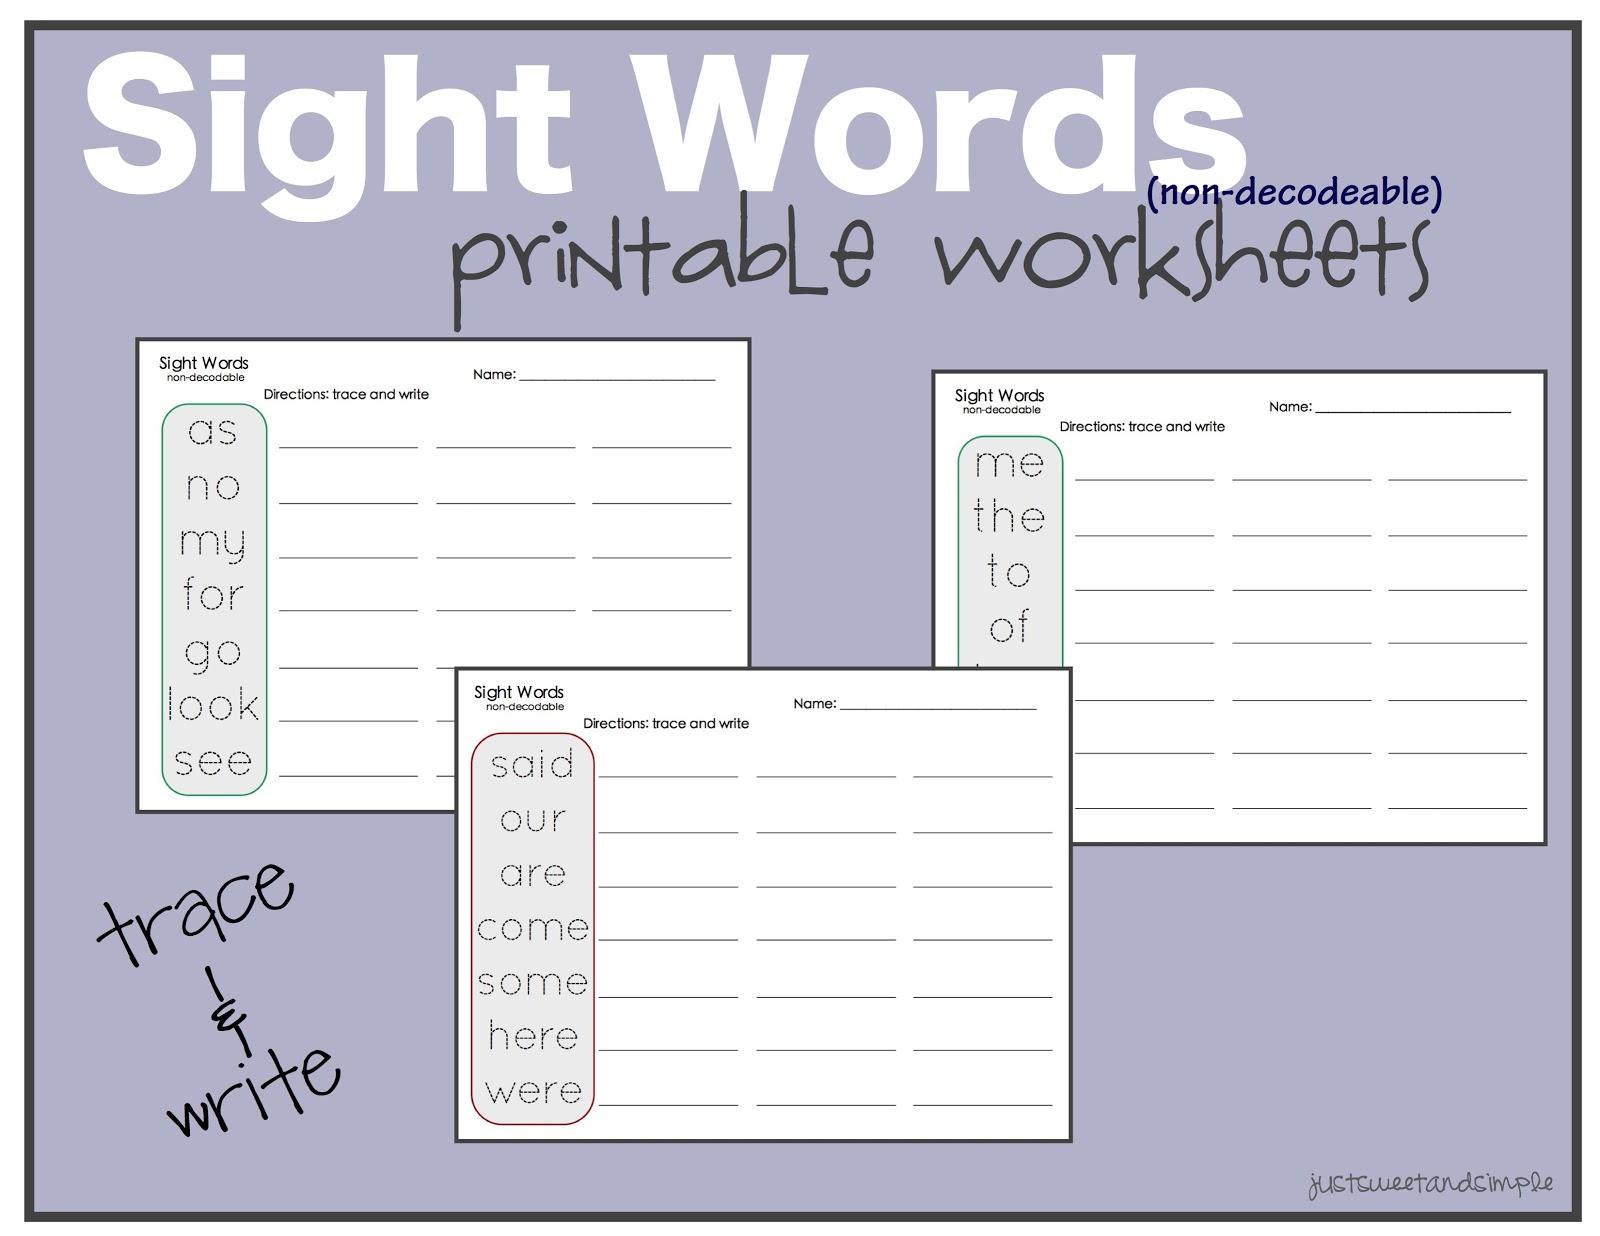 worksheet Kindergarten Sight Words Worksheet worksheet free printable kindergarten sight word worksheets grass words words1st magnificent list wosenly best words